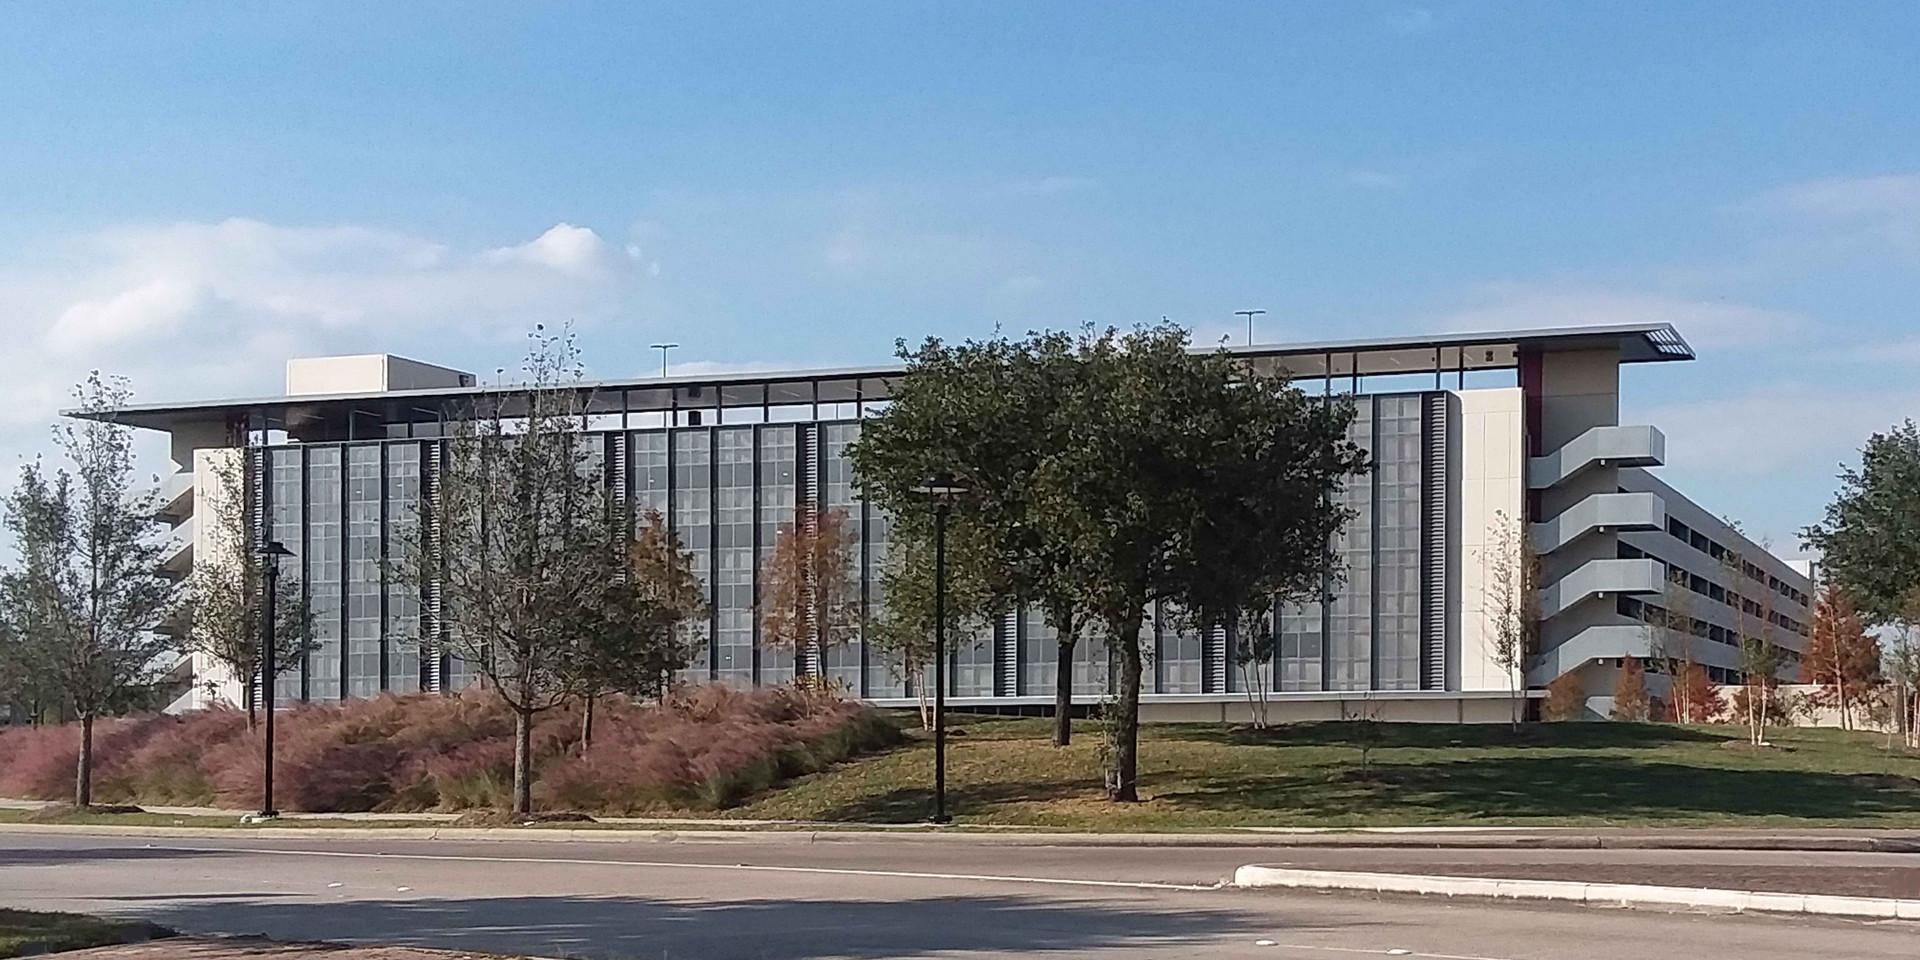 University of Houston Parking Garage #6